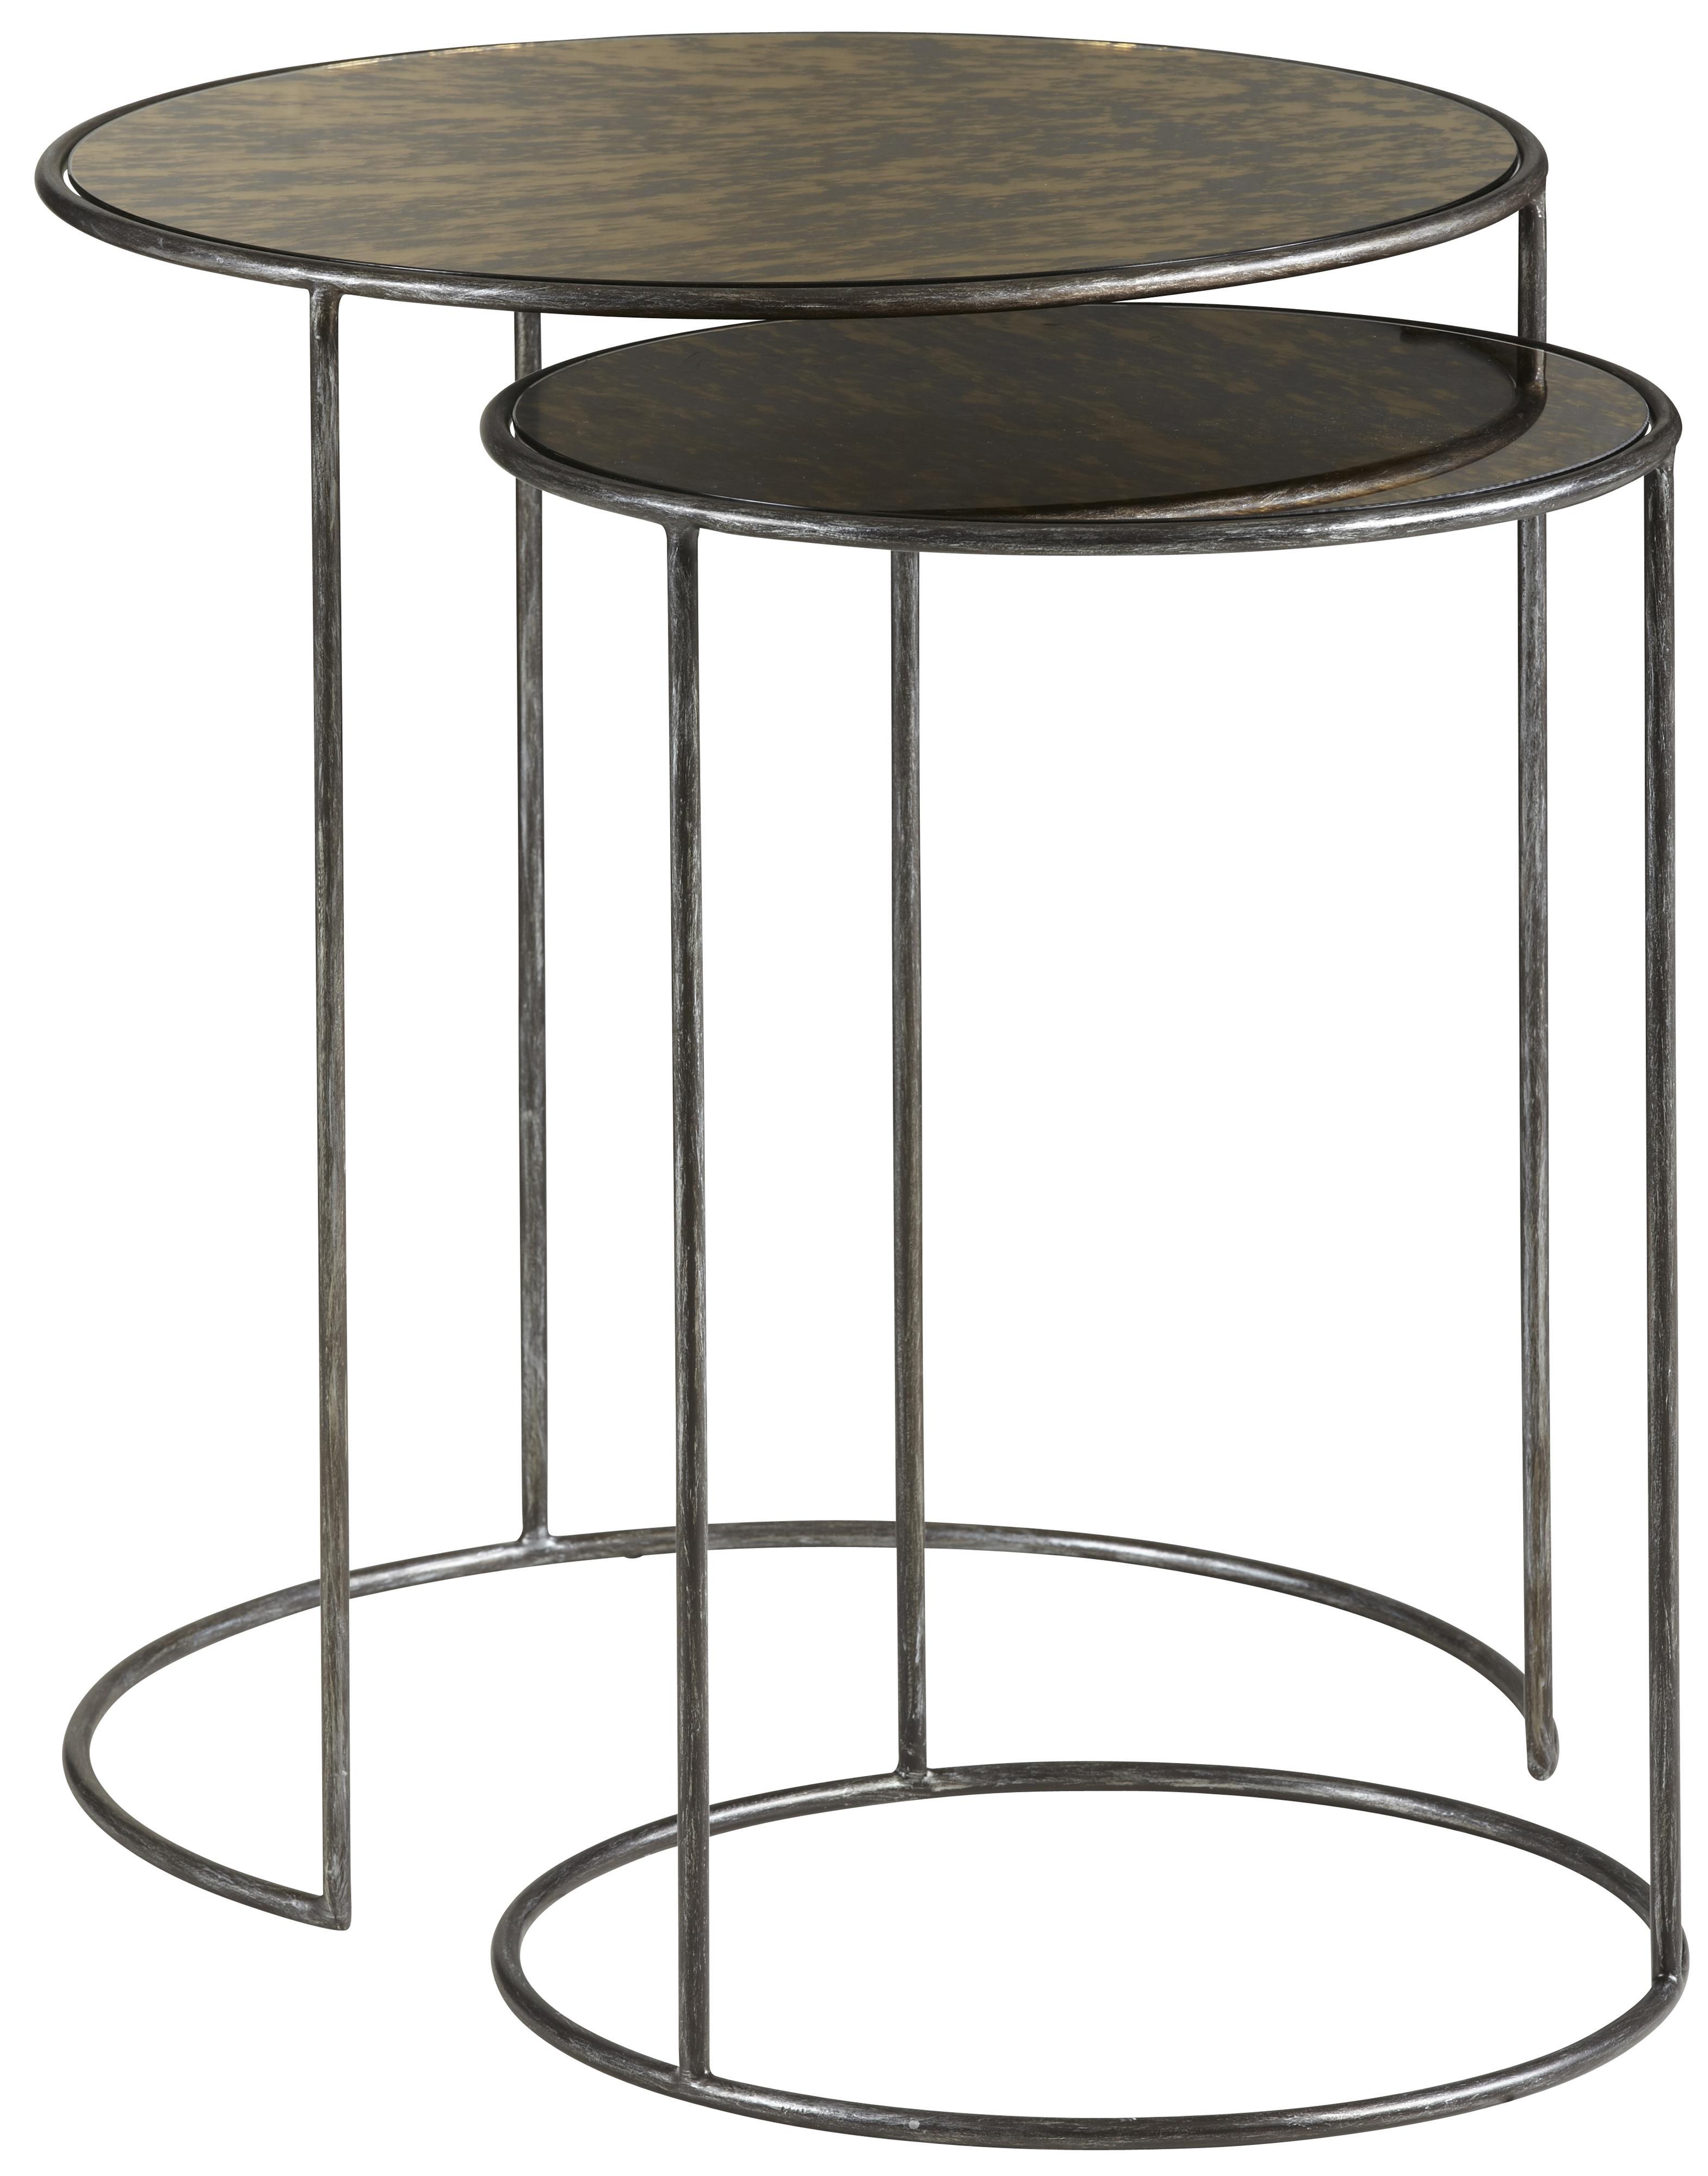 Belfort Signature Urban Treasures Shaw Nesting Tables - Item Number: 223369-1251